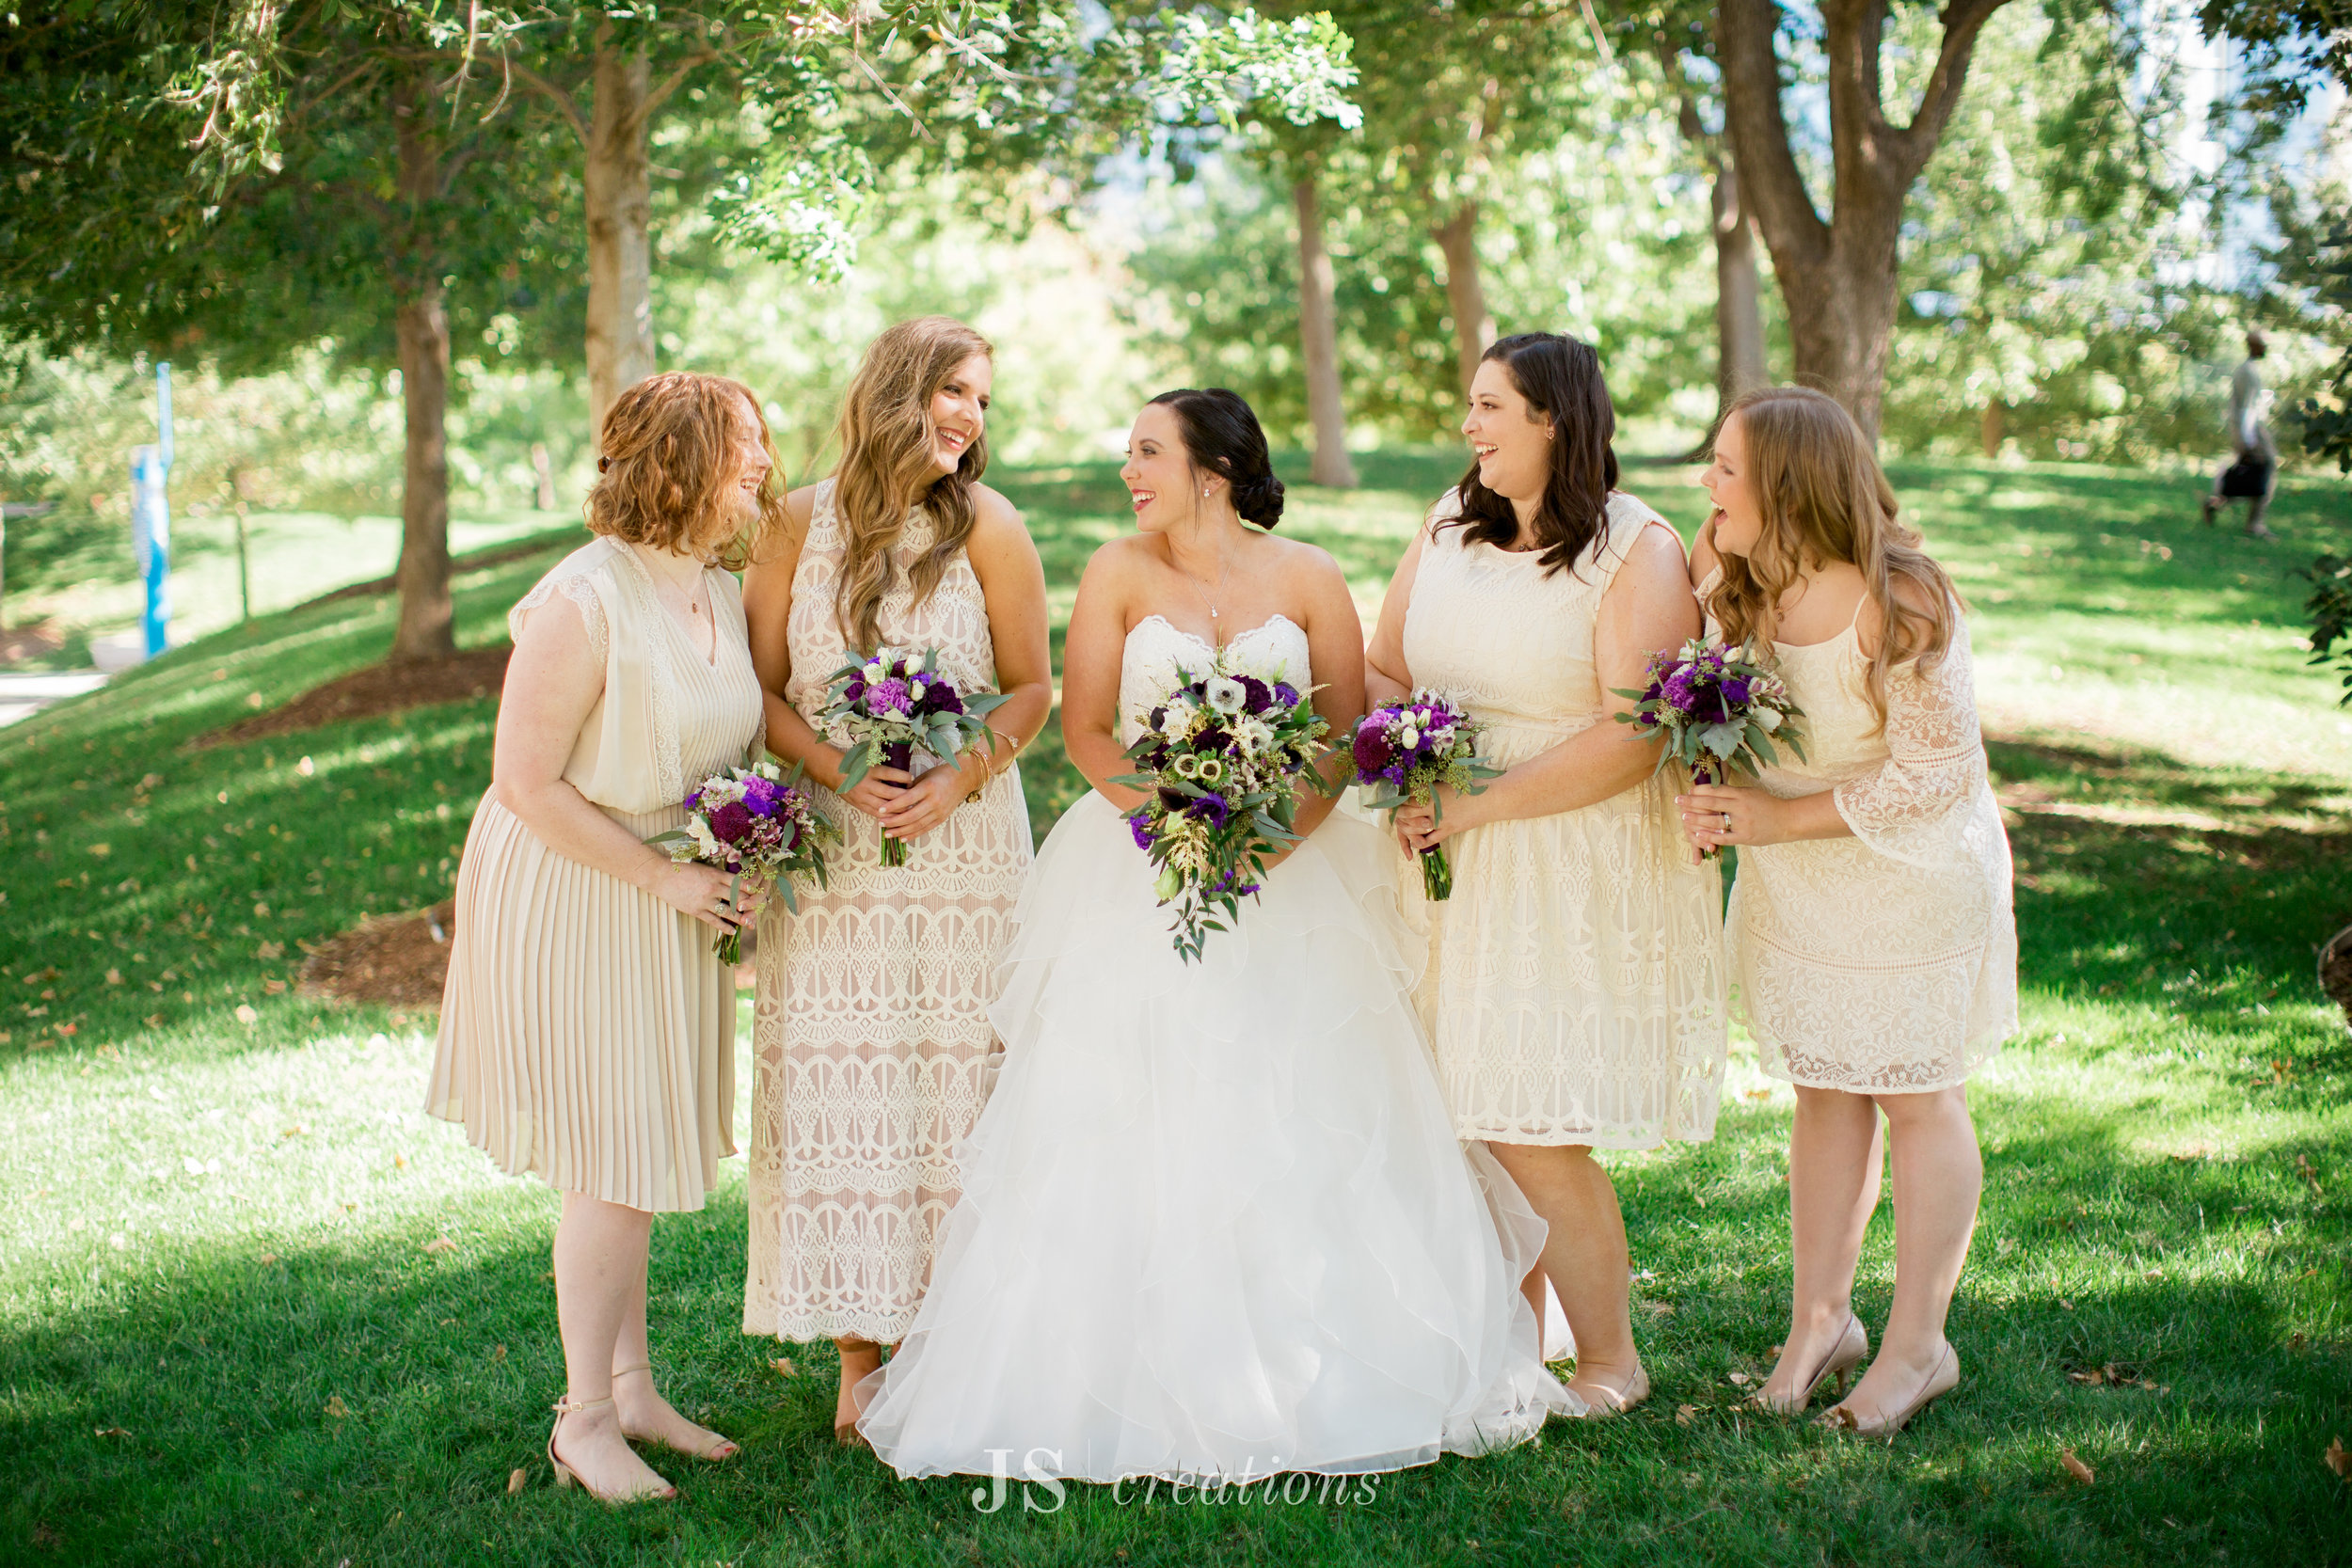 JSCreations_Weddings-121.jpg